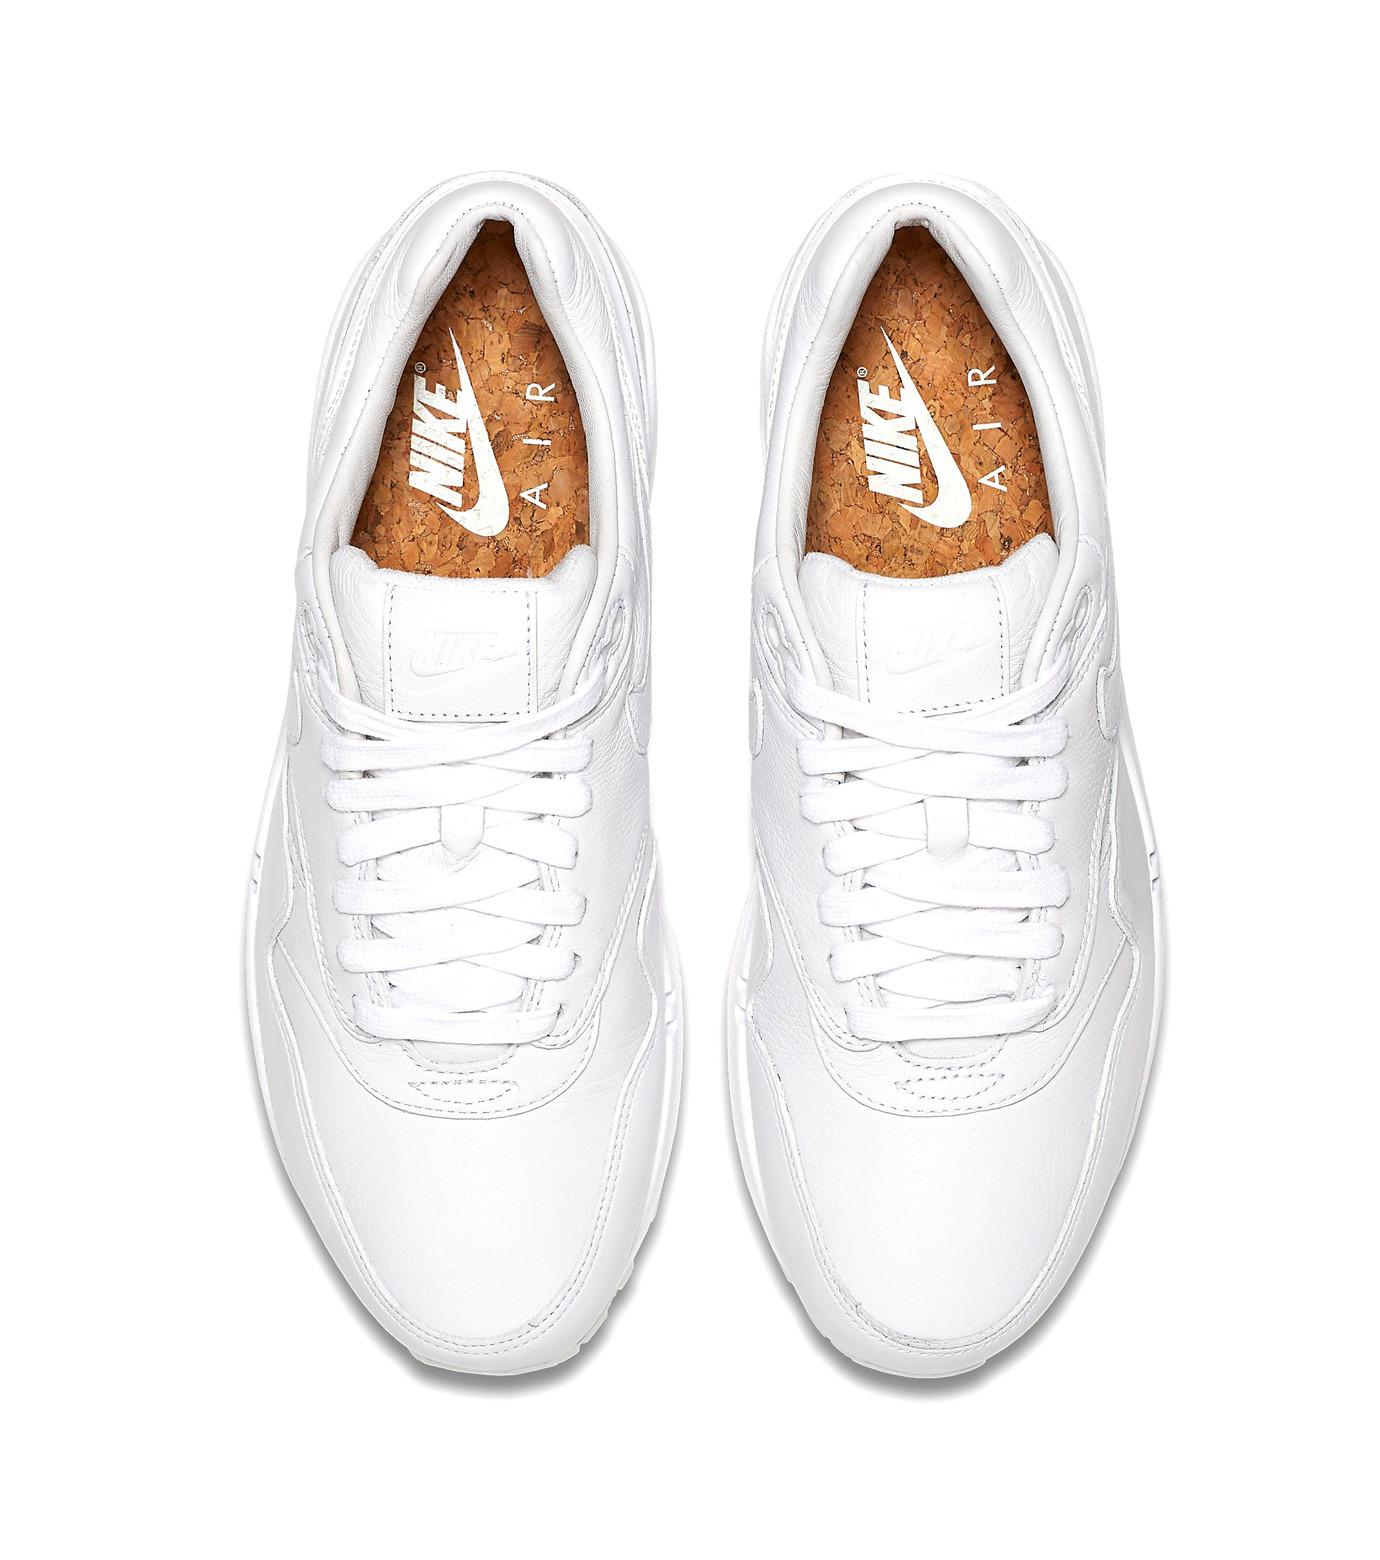 NIKE(ナイキ)のAIR MAX 1 PINNACLE-WHITE(シューズ/shoes)-859554-100-4 拡大詳細画像4